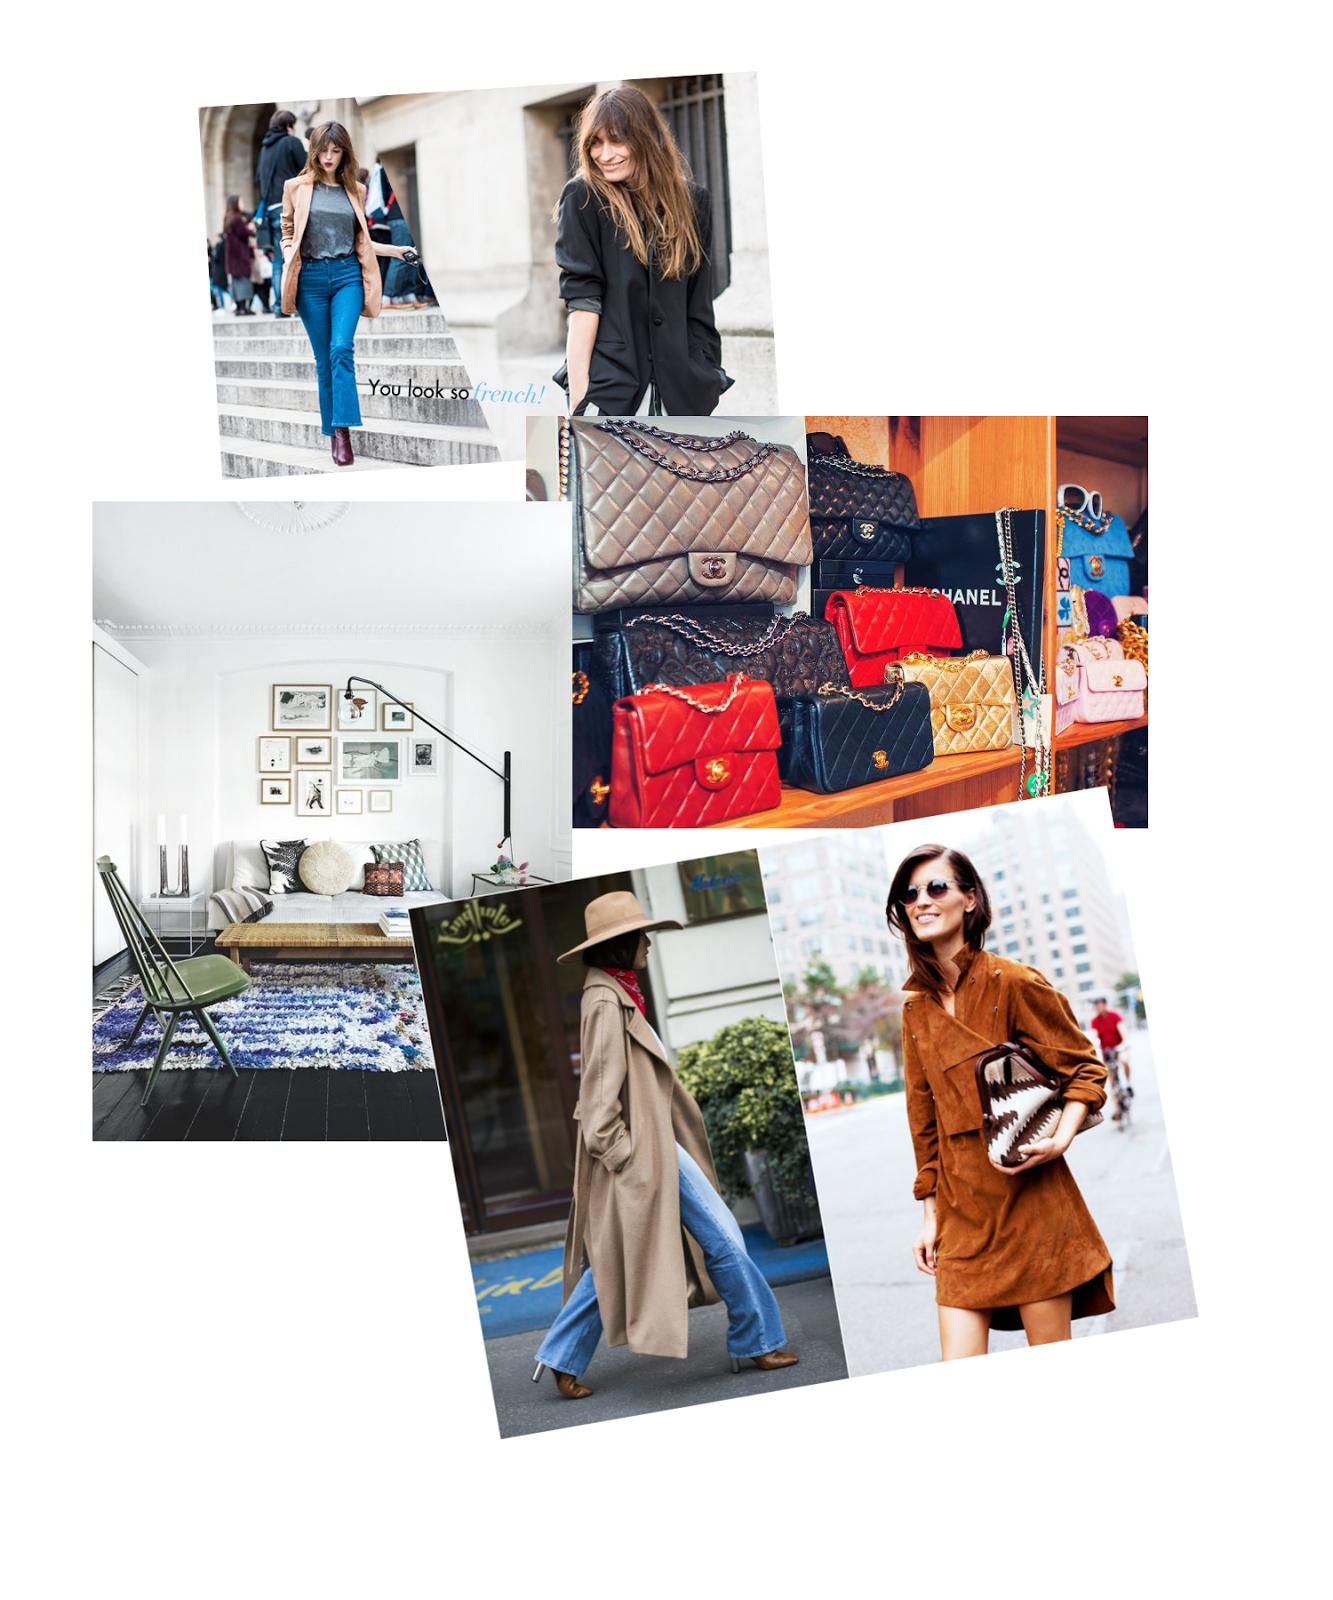 Chanel erhöt Preise um 30% Paris 70s Vibes Fashion Scnadinavian Interior clicksoftheweek